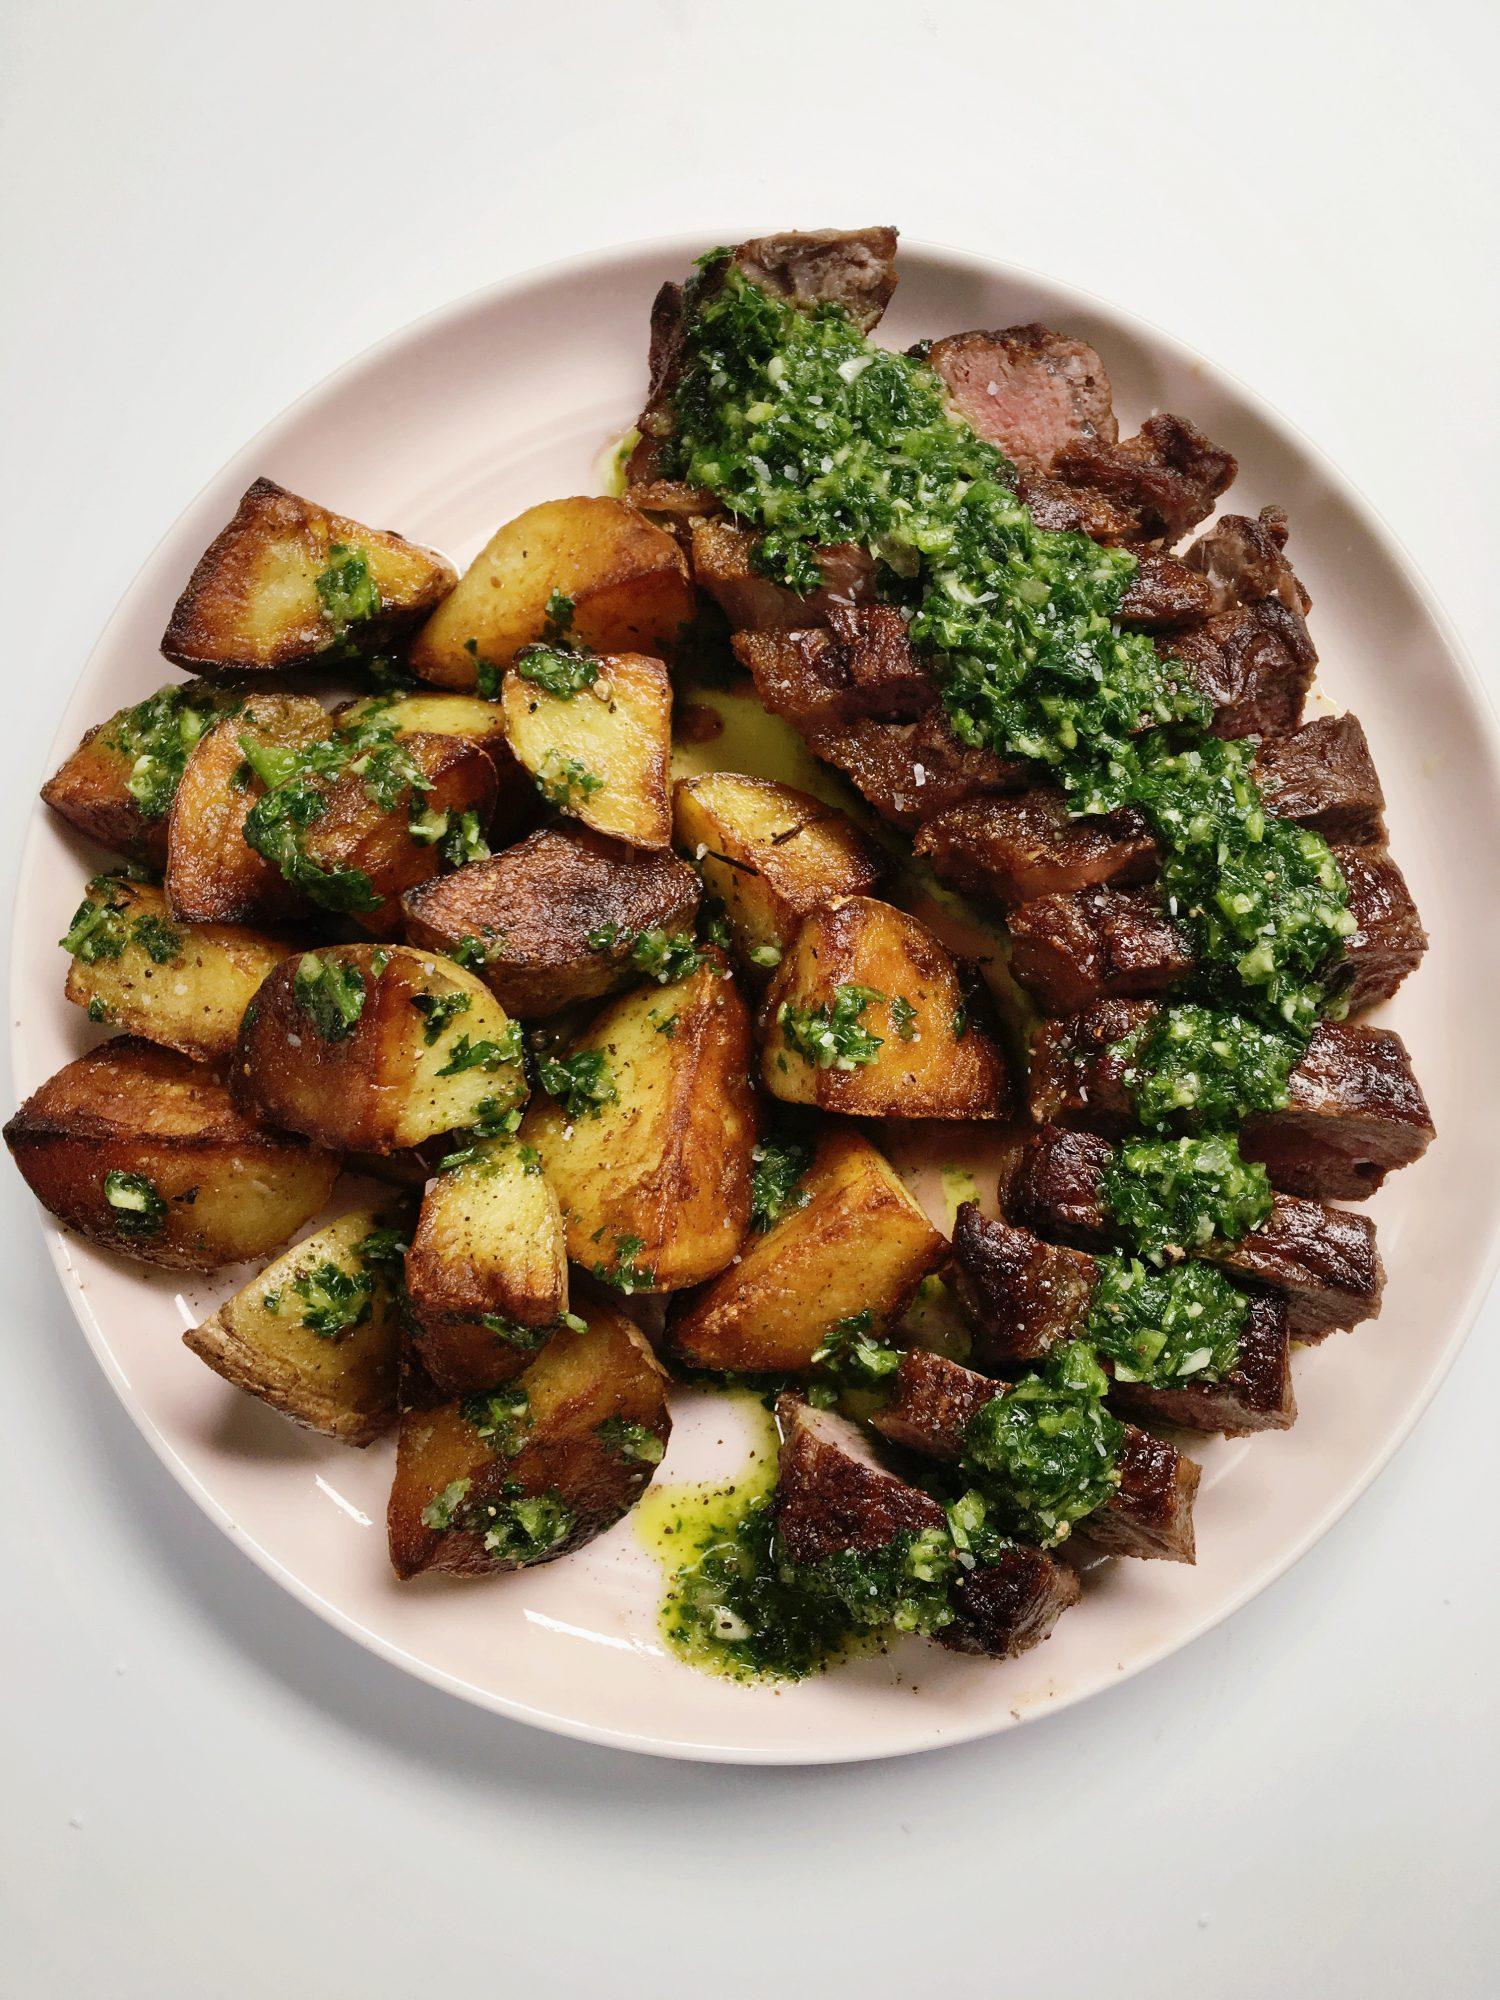 Easy Steak Dinner with Potatoes